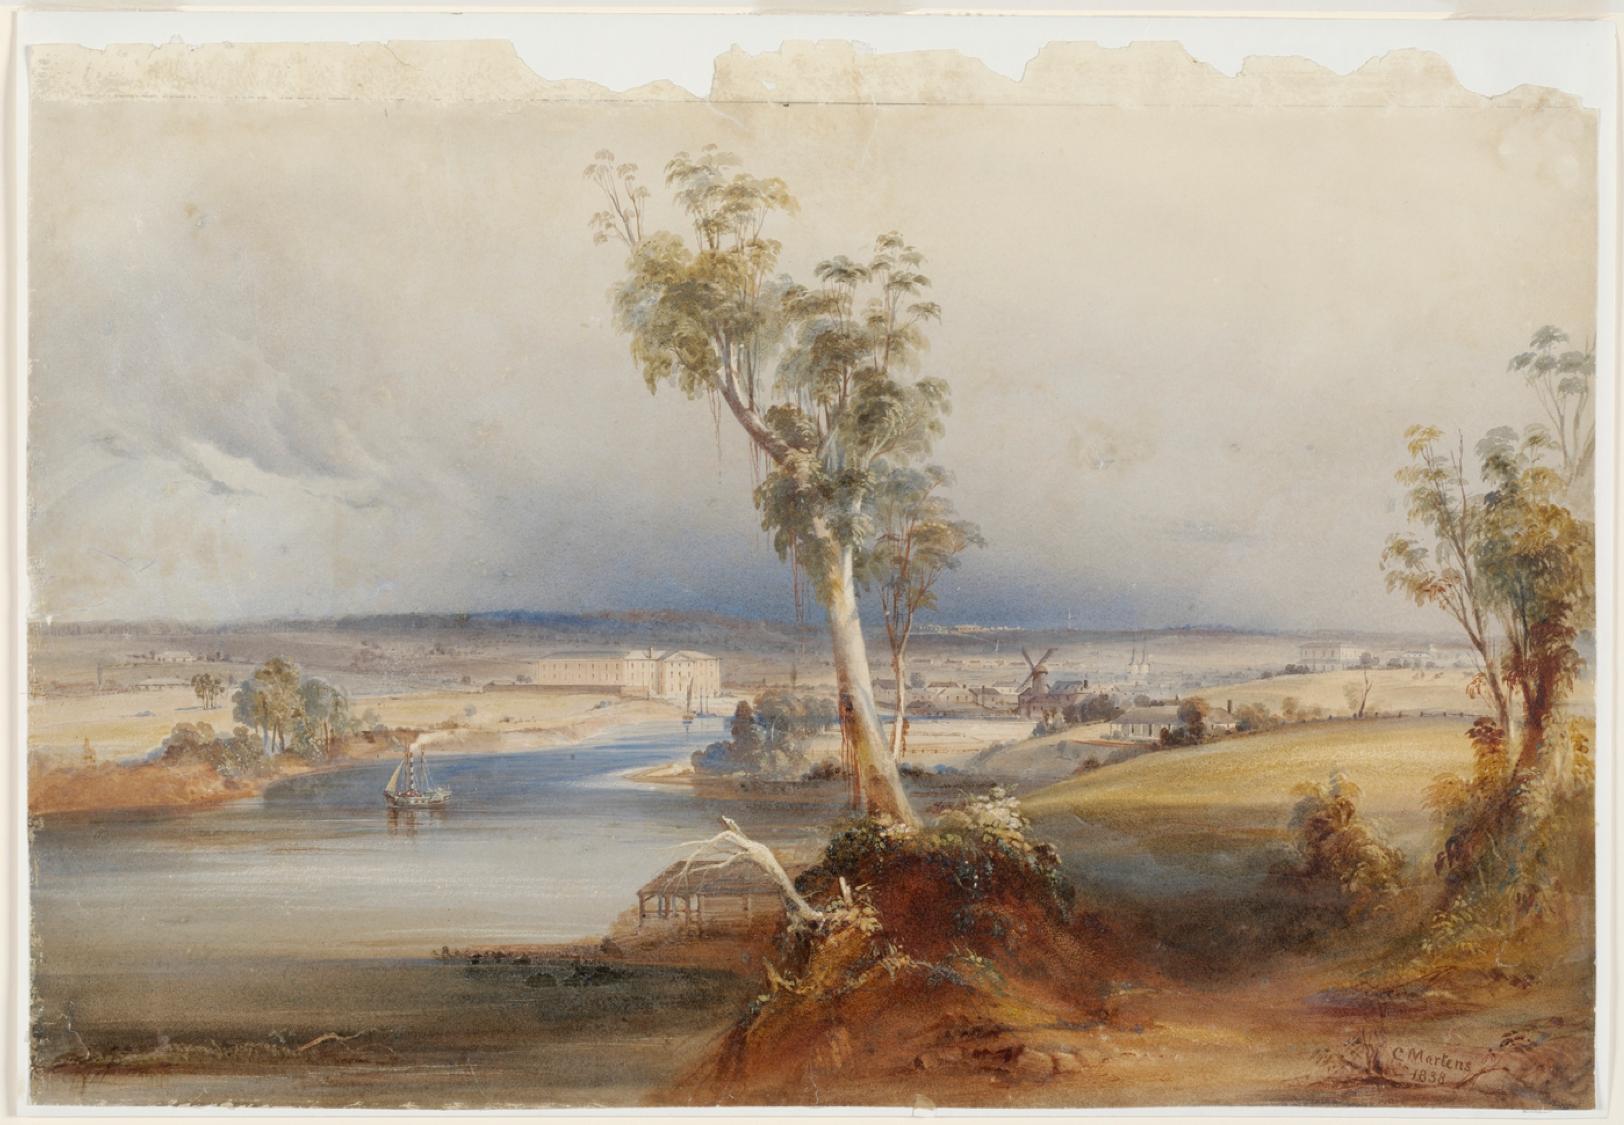 Conrad Martens, View of Parramatta, 1838, Samuel Marsden, Macarthur, James Ruse, John Irving, Thomas Arndell, Vineyards, Parramatta, St. John's Cemetery Project, Old Parramattans